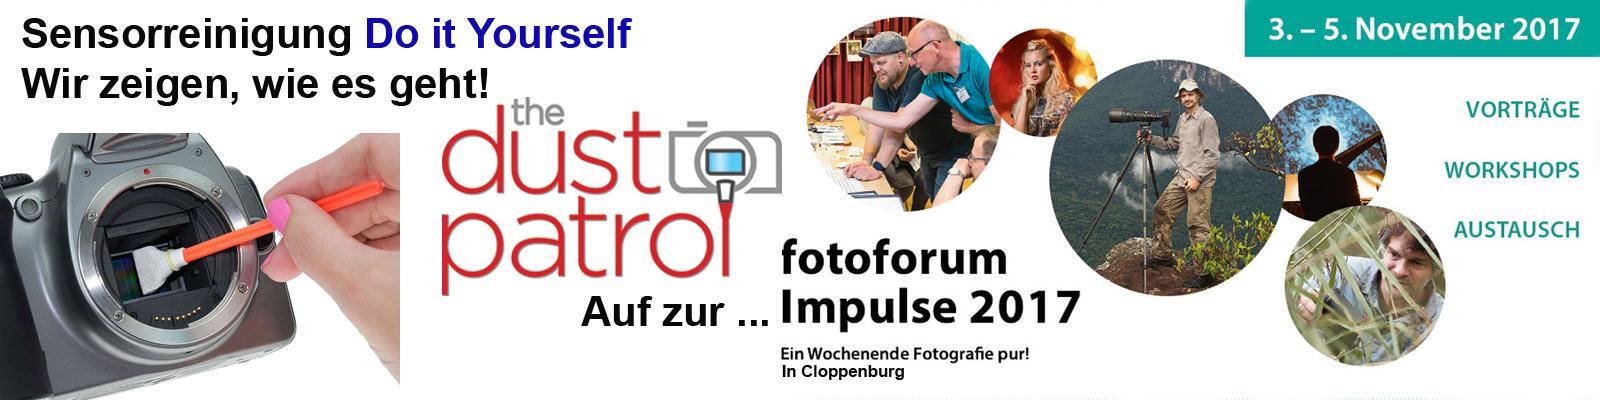 Fotoforum_2017